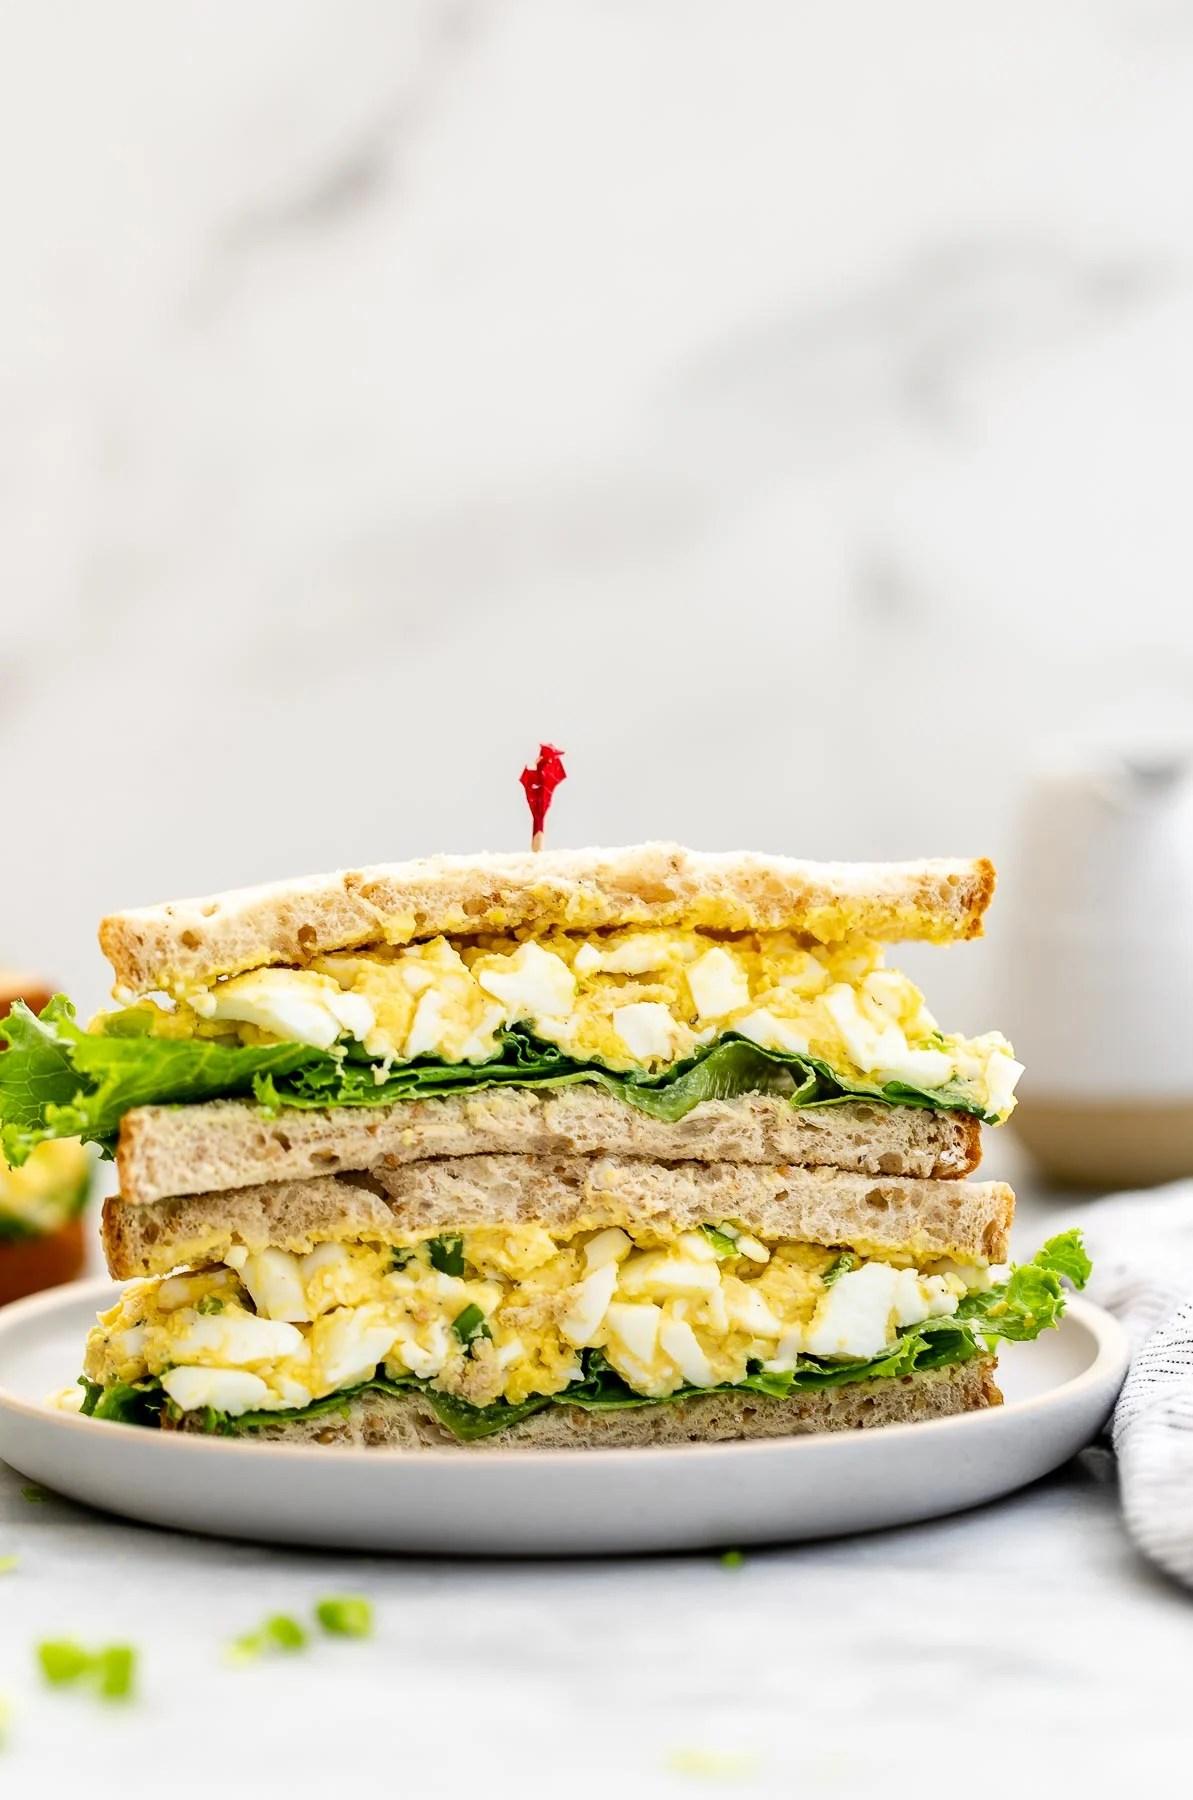 Healthy egg salad sandwich cut in half on a small plate.